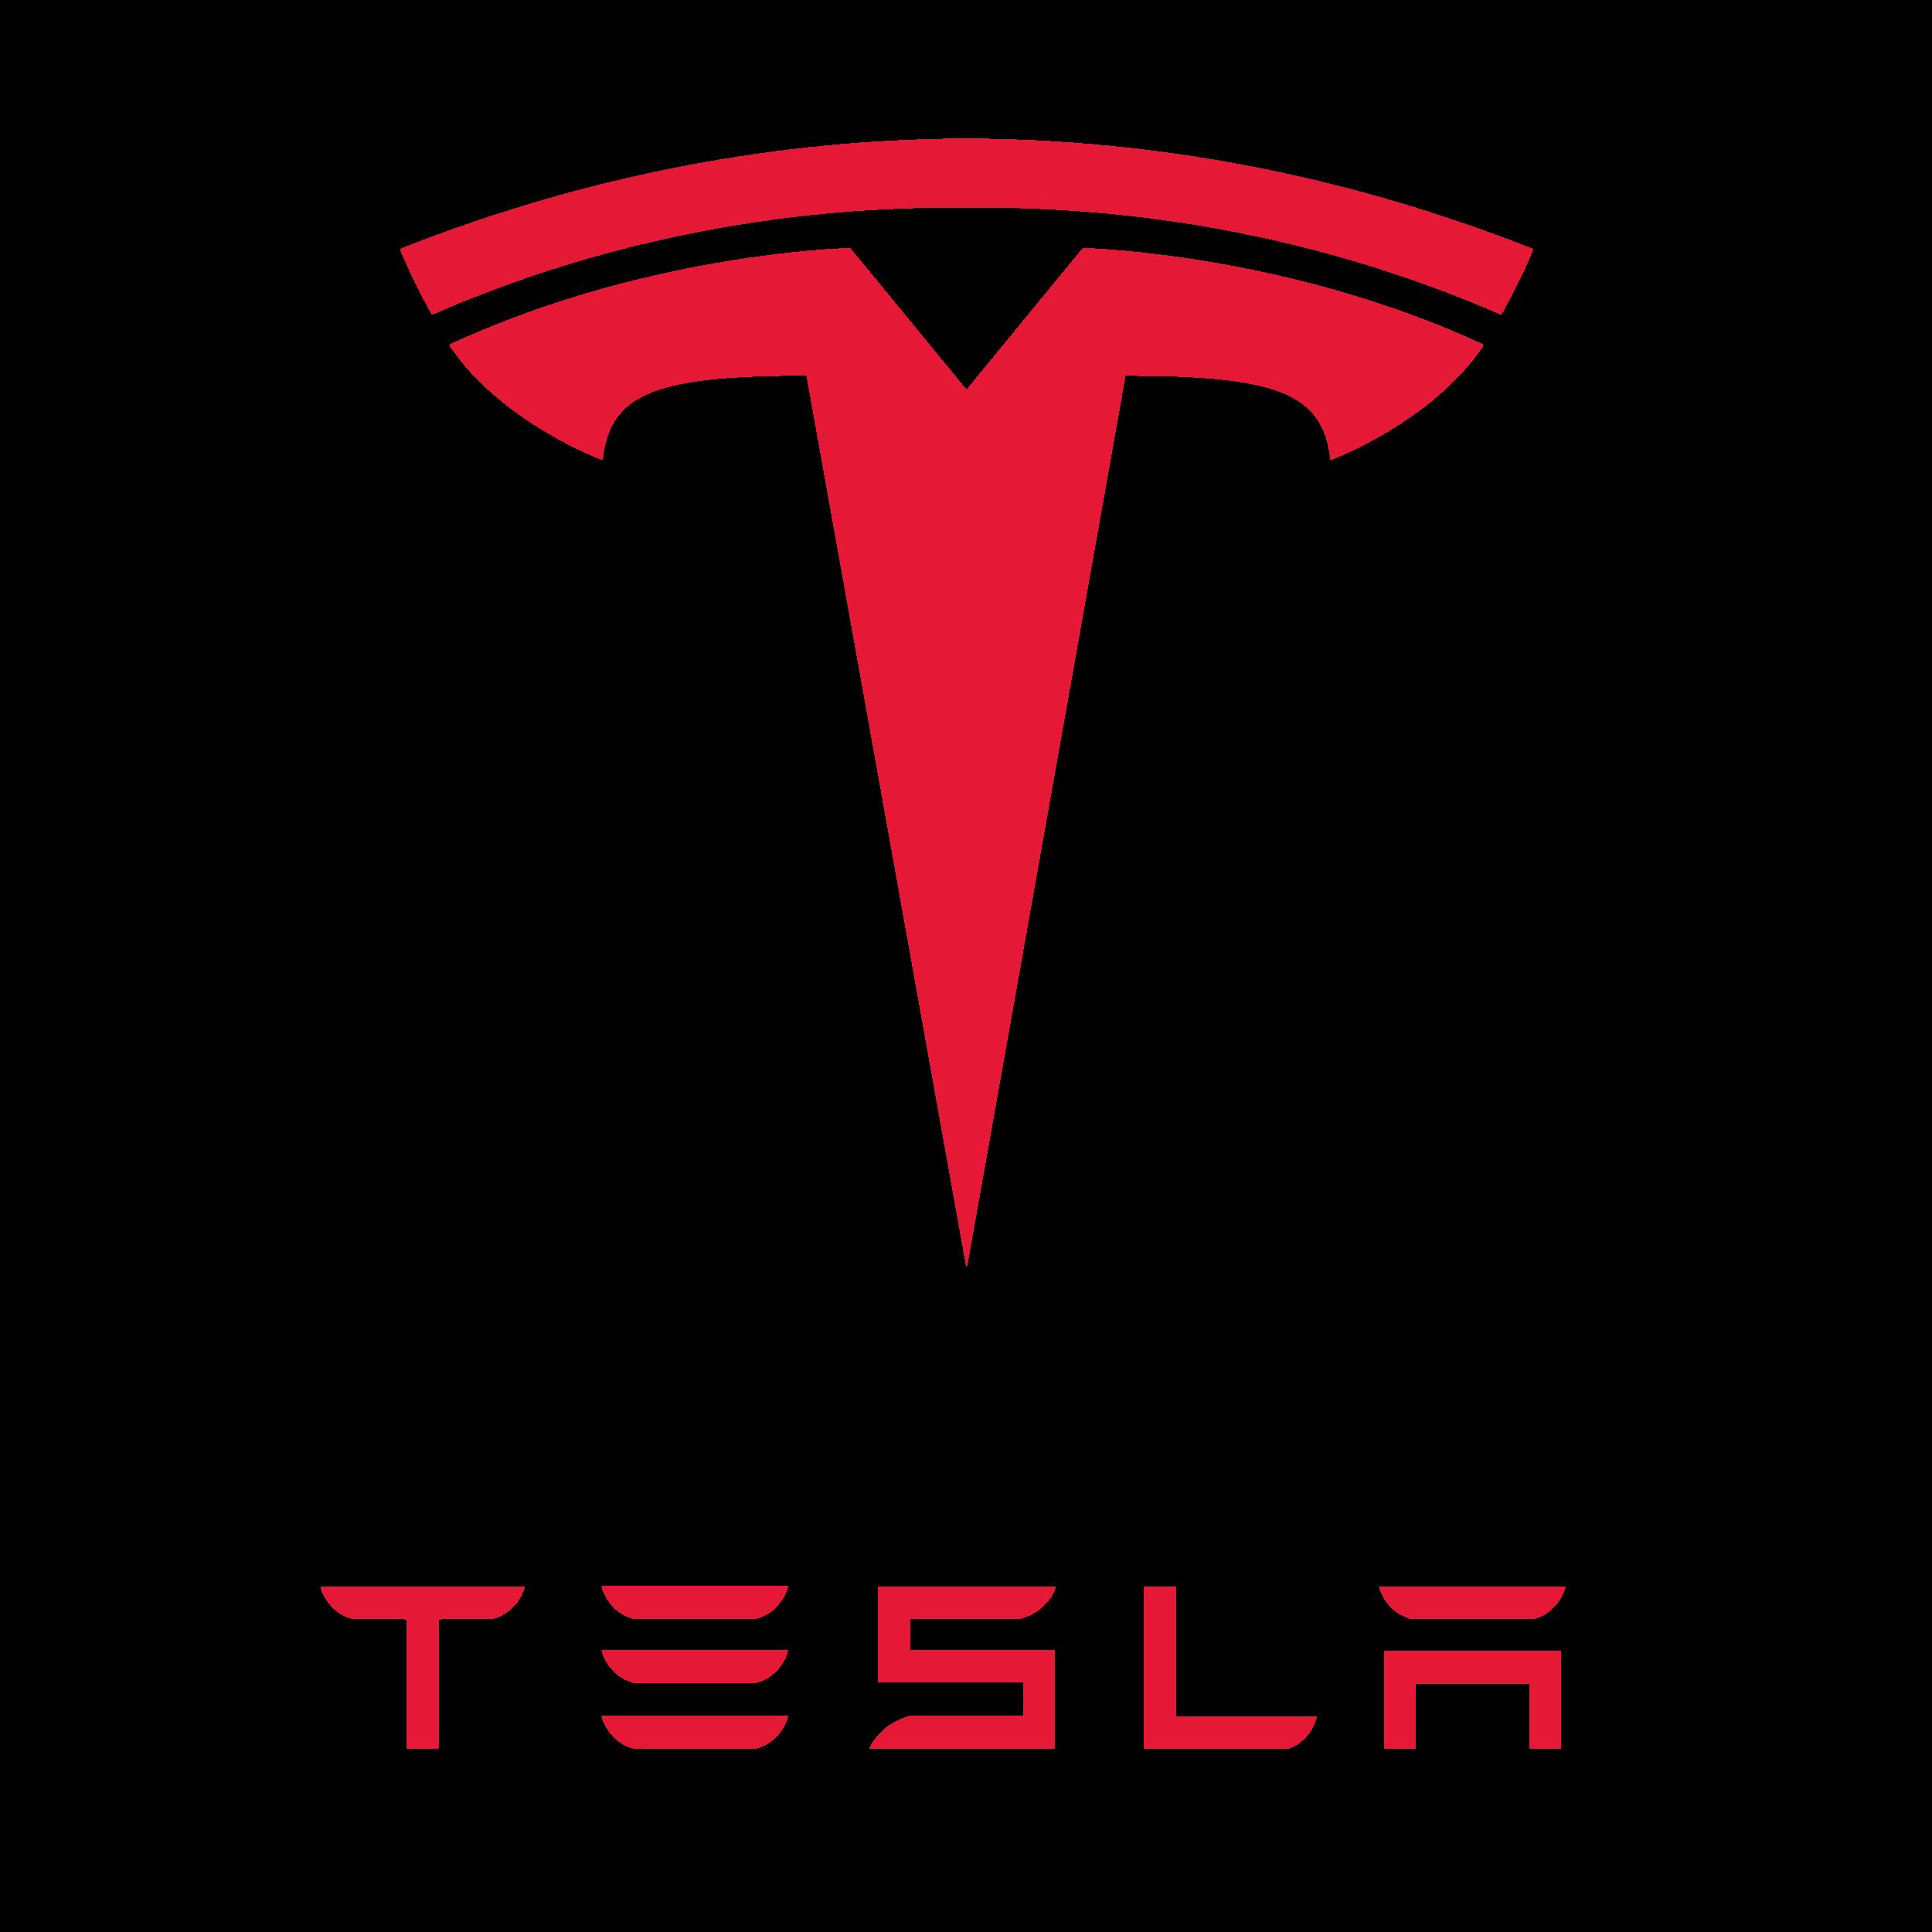 Car Logo Tesla